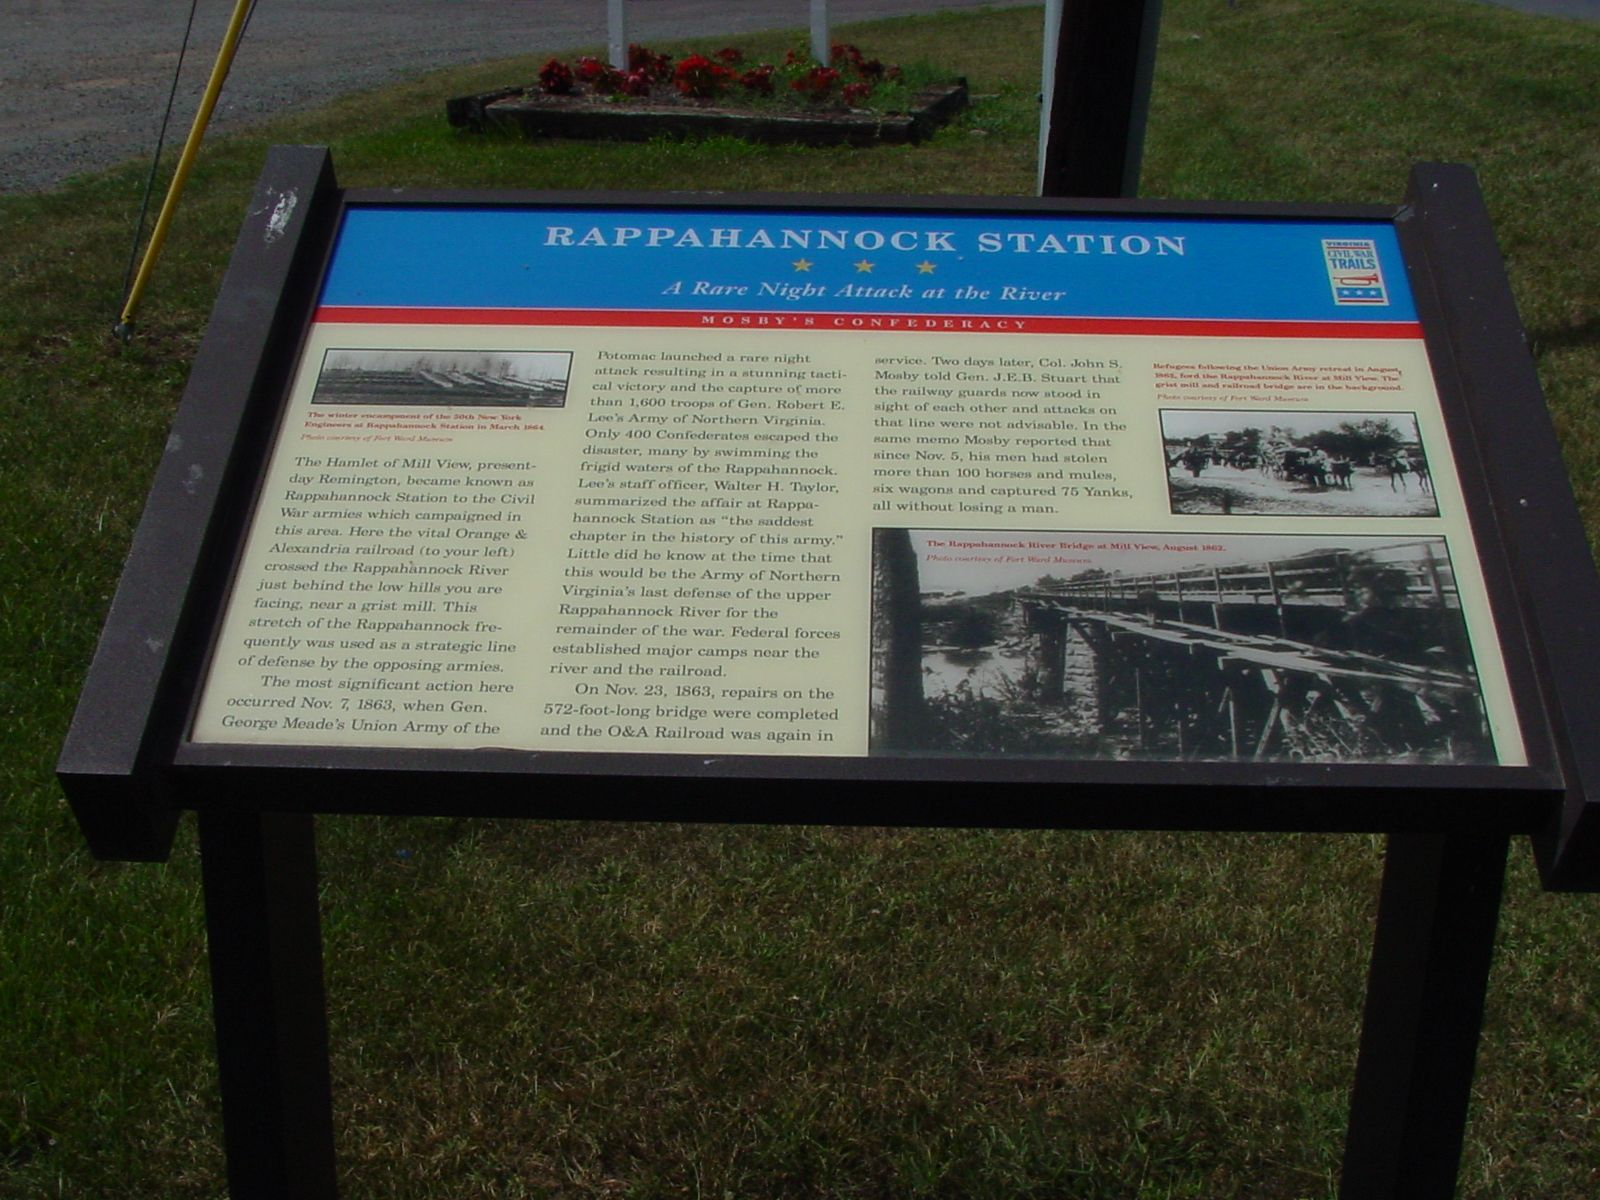 Rappahannock Station Marker